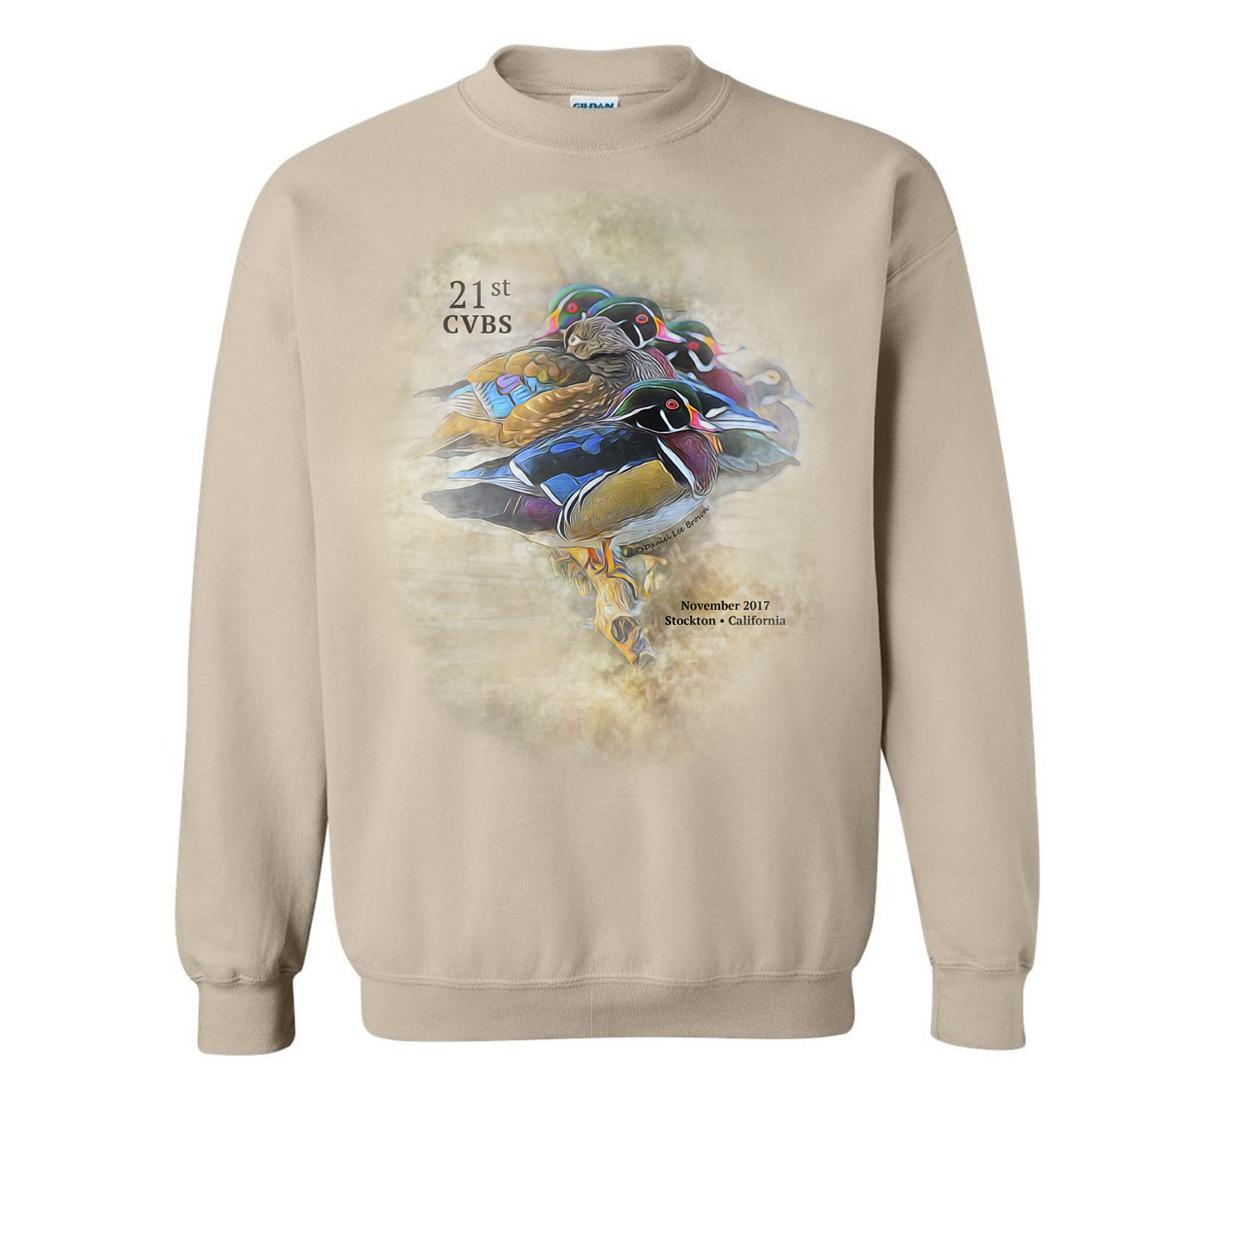 Unisex Sweatshirt (color: Sand)